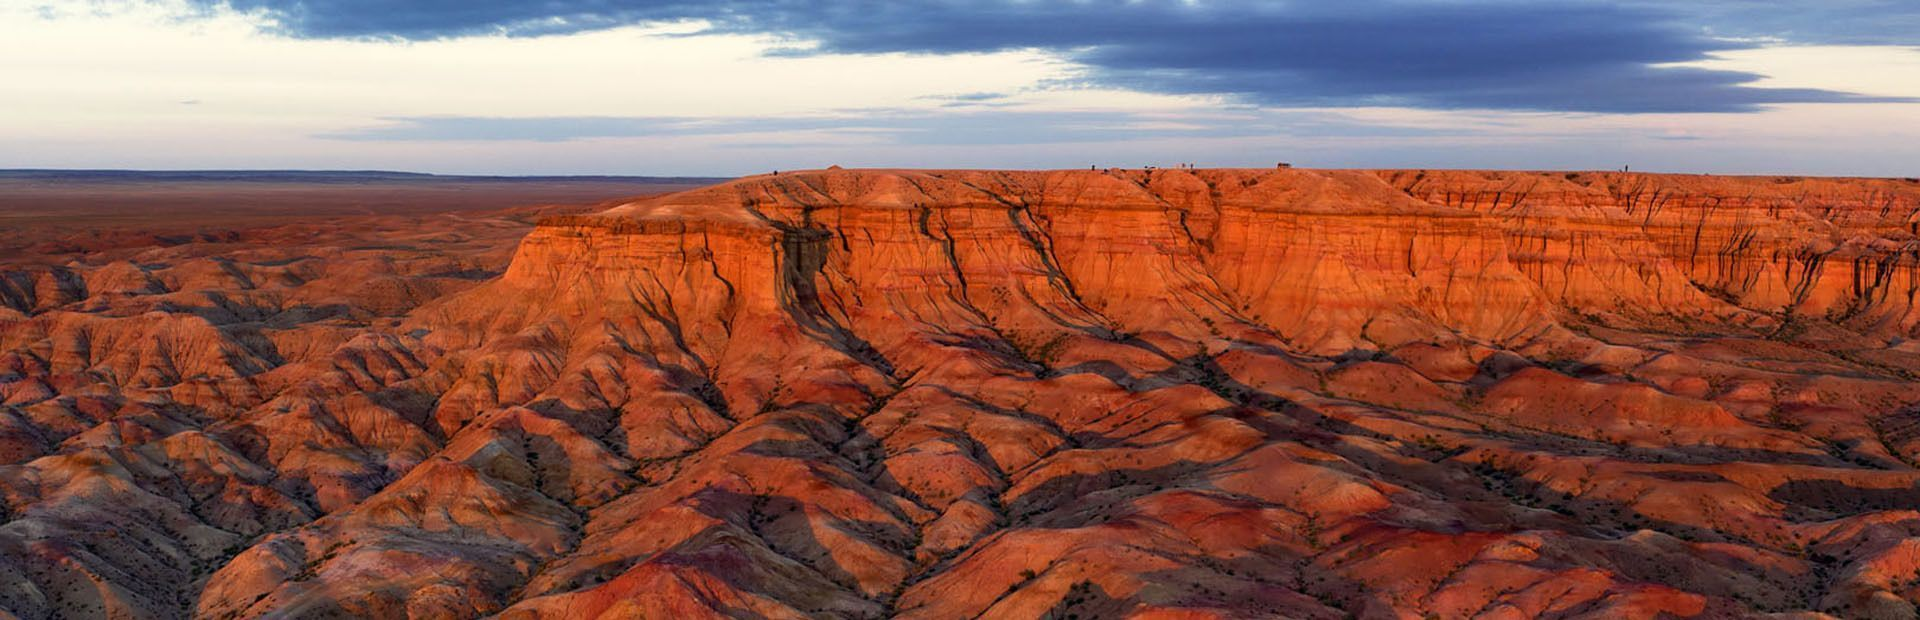 Mongolia: da Ulan Bator al deserto del Gobi